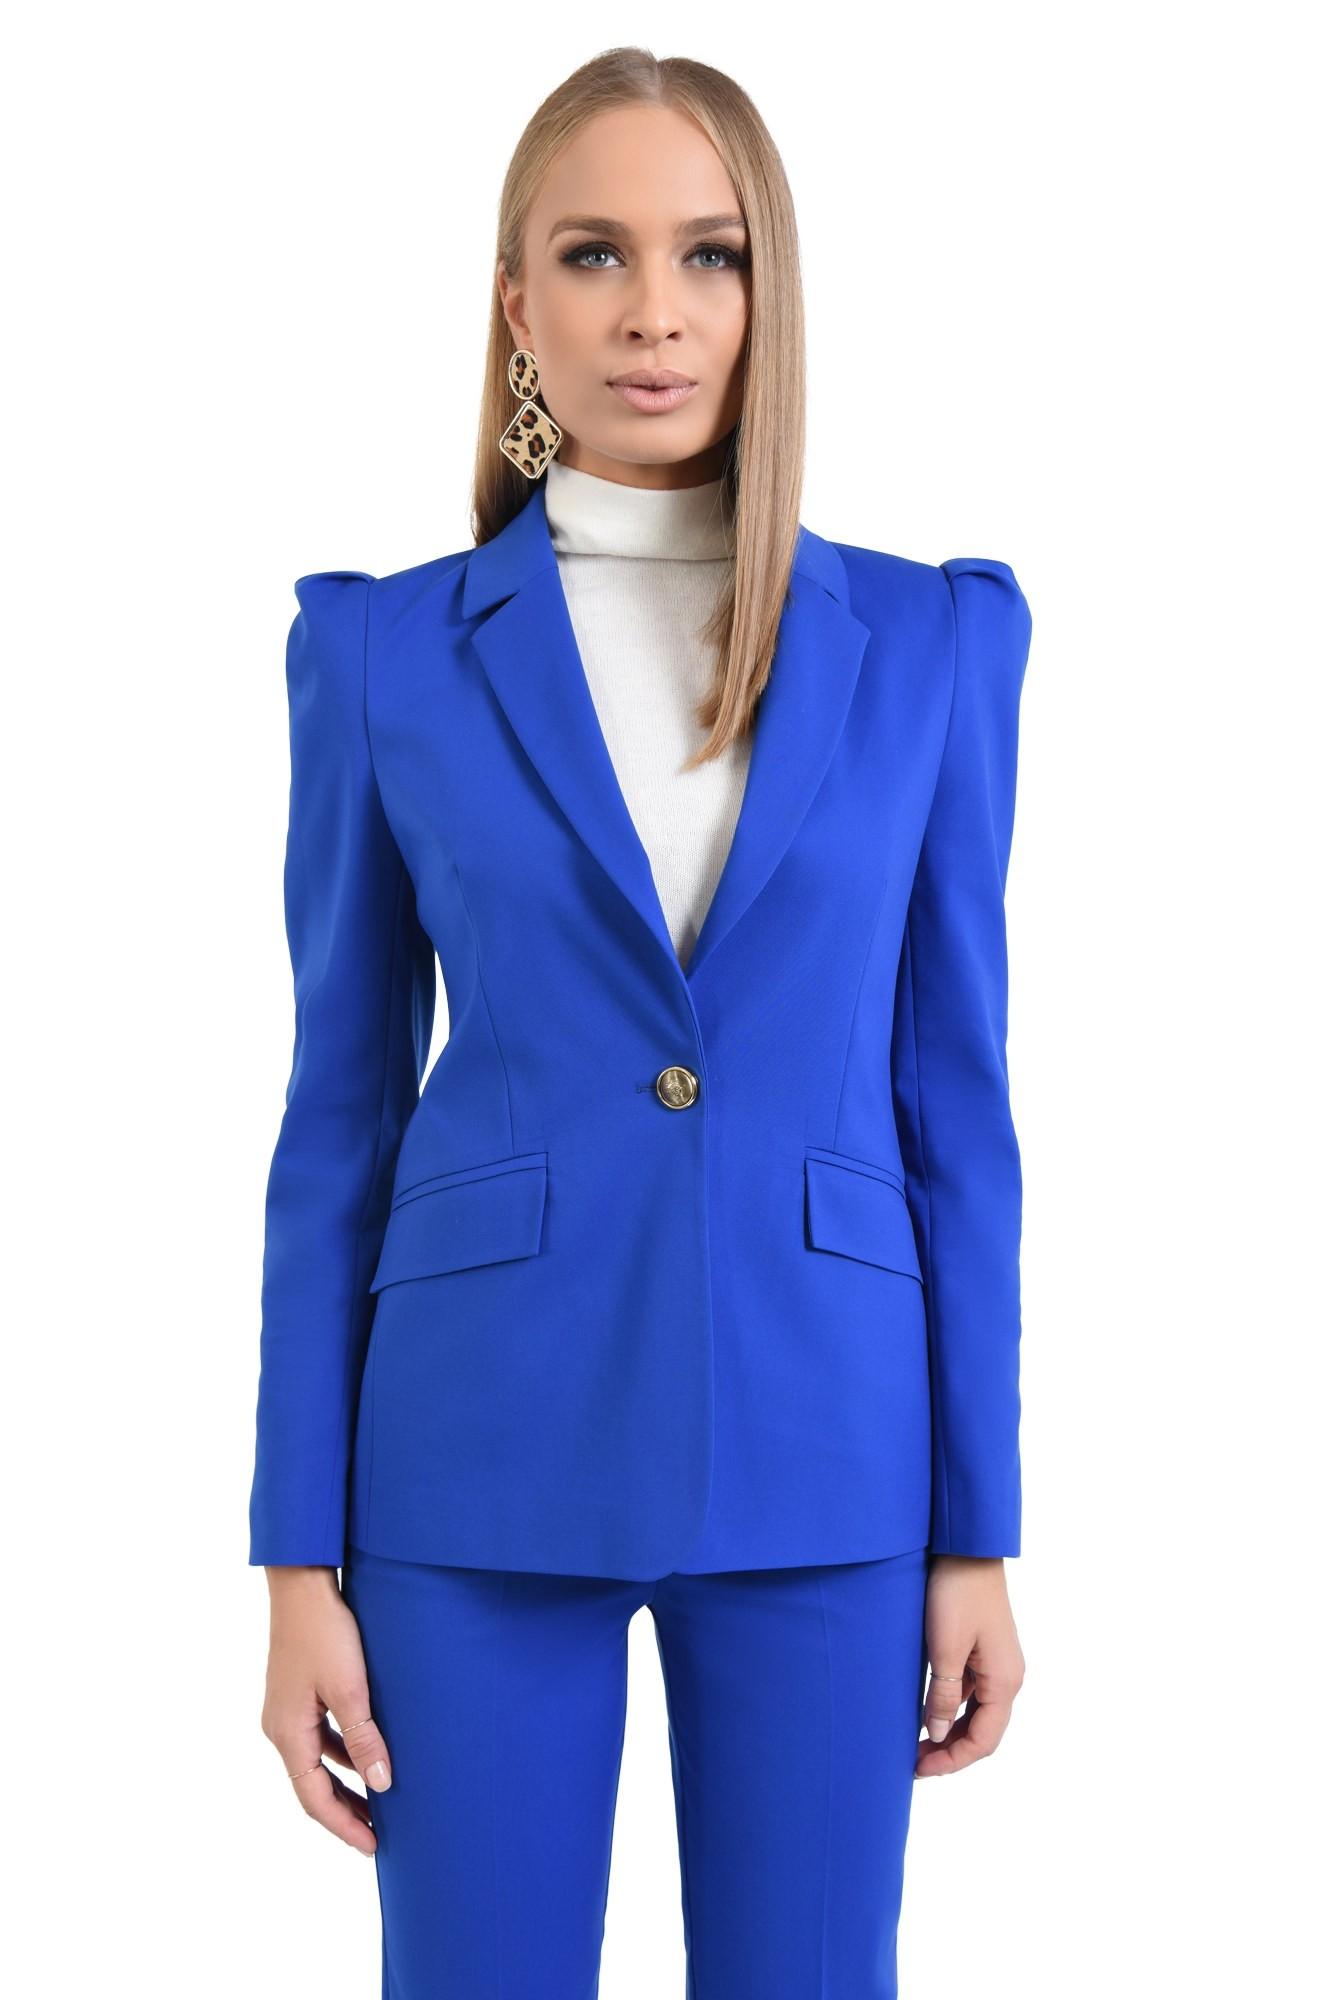 0 - pantaloni dama, online, costum, albastru, croi conic